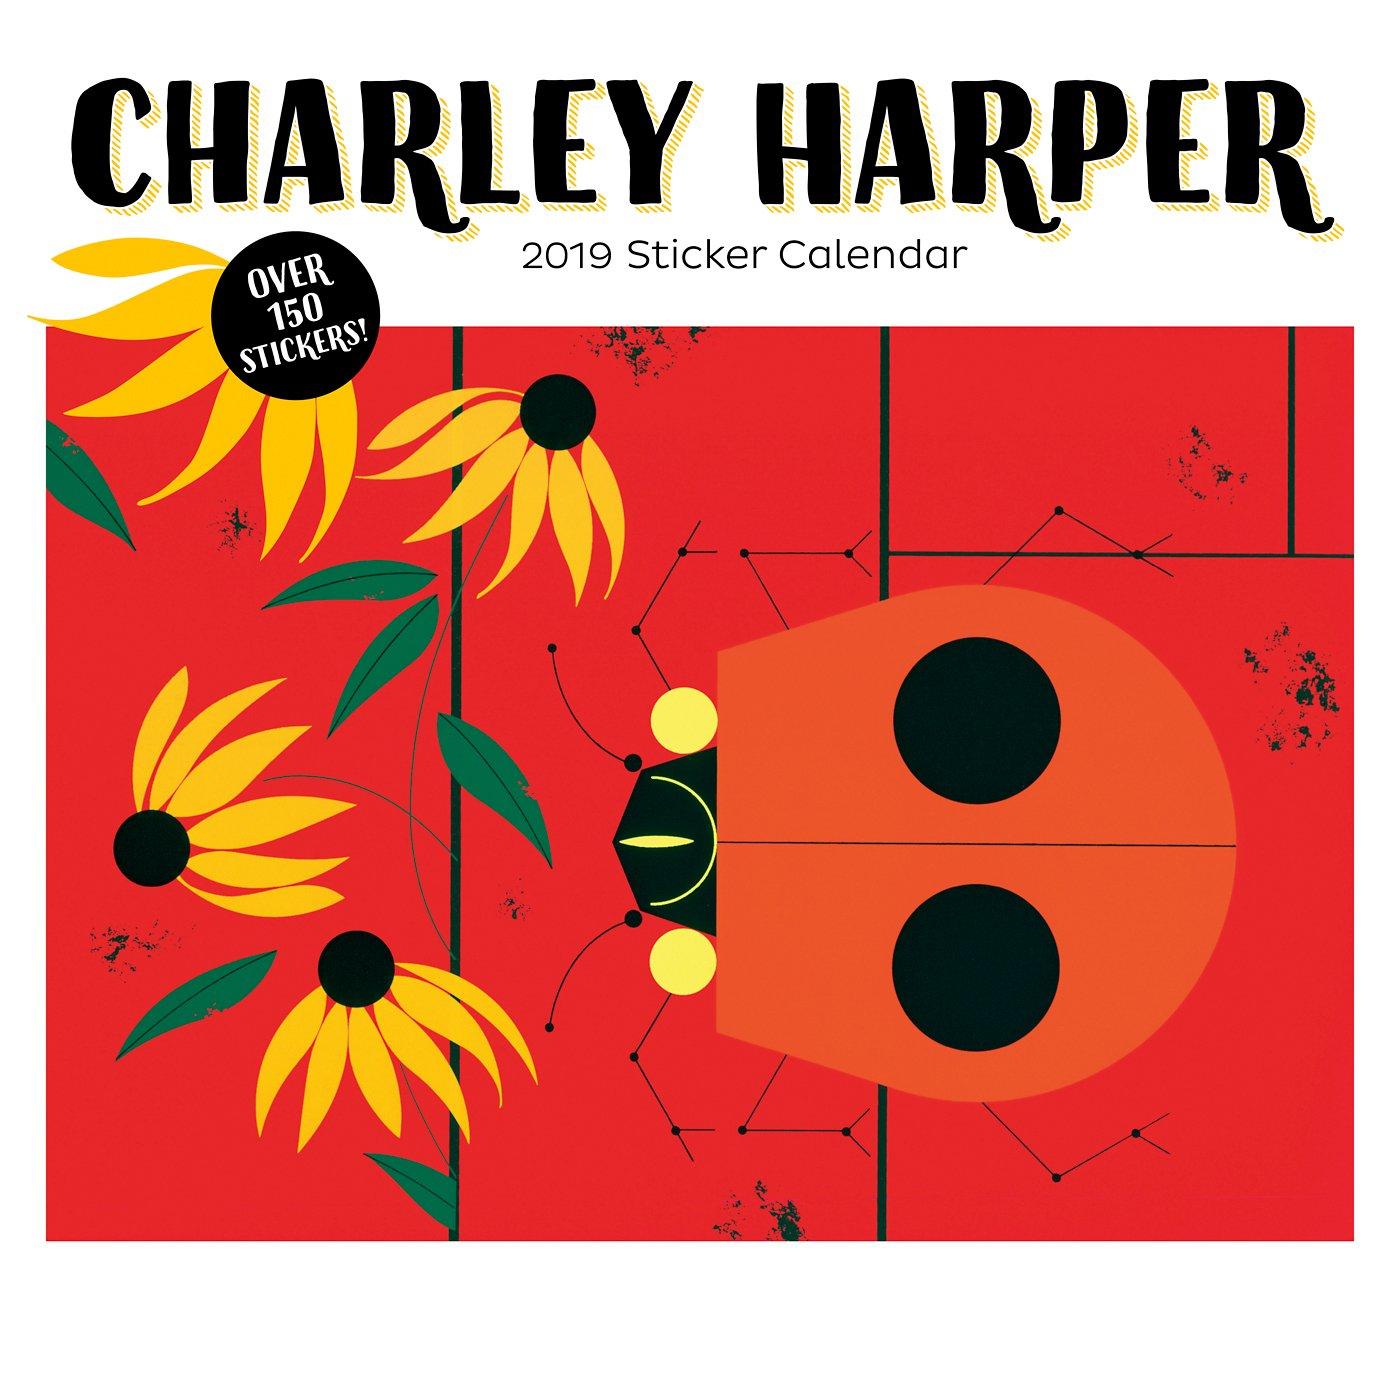 Charley Harper 2019 Sticker Calendar: Charley Harper: 9780764980251:  Amazon.com: Books